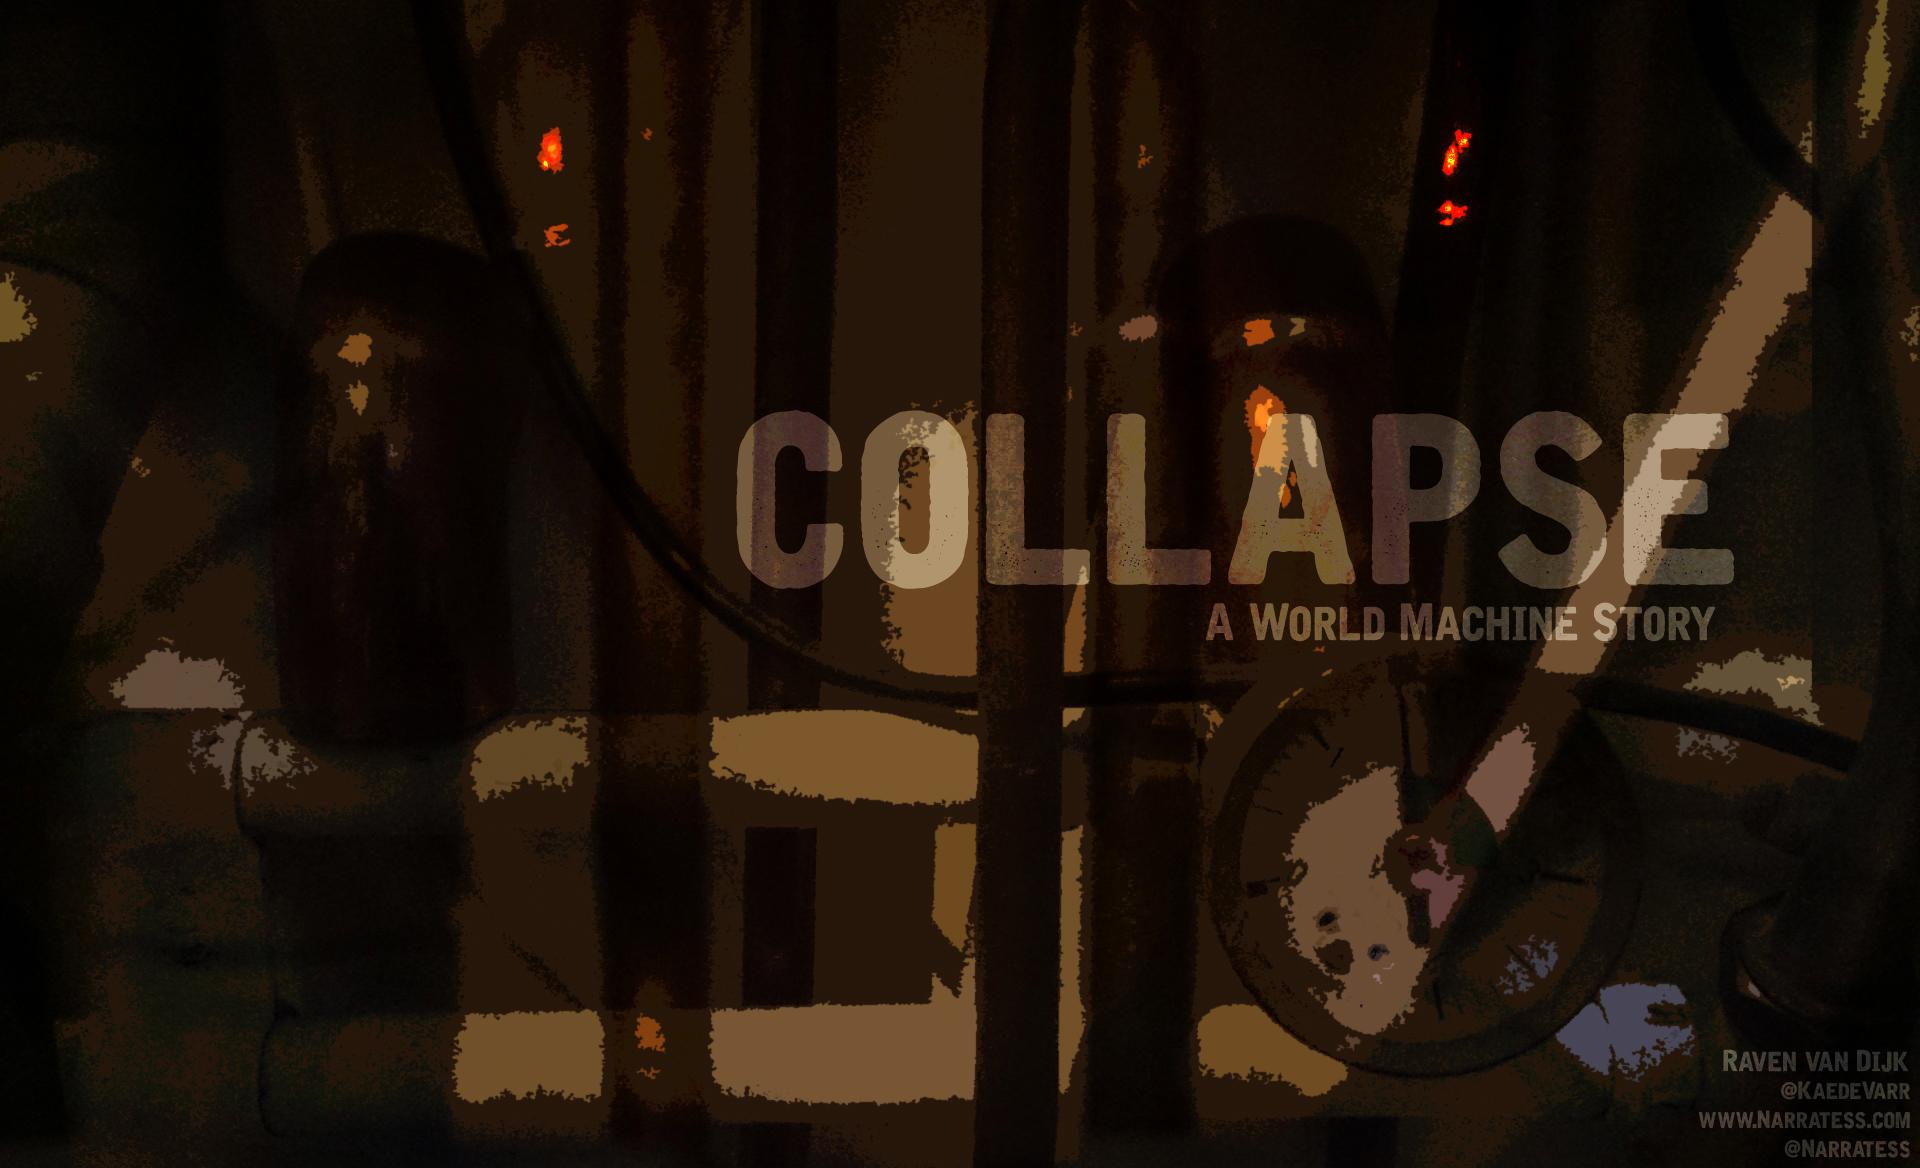 [13-01-17] -Collapse-